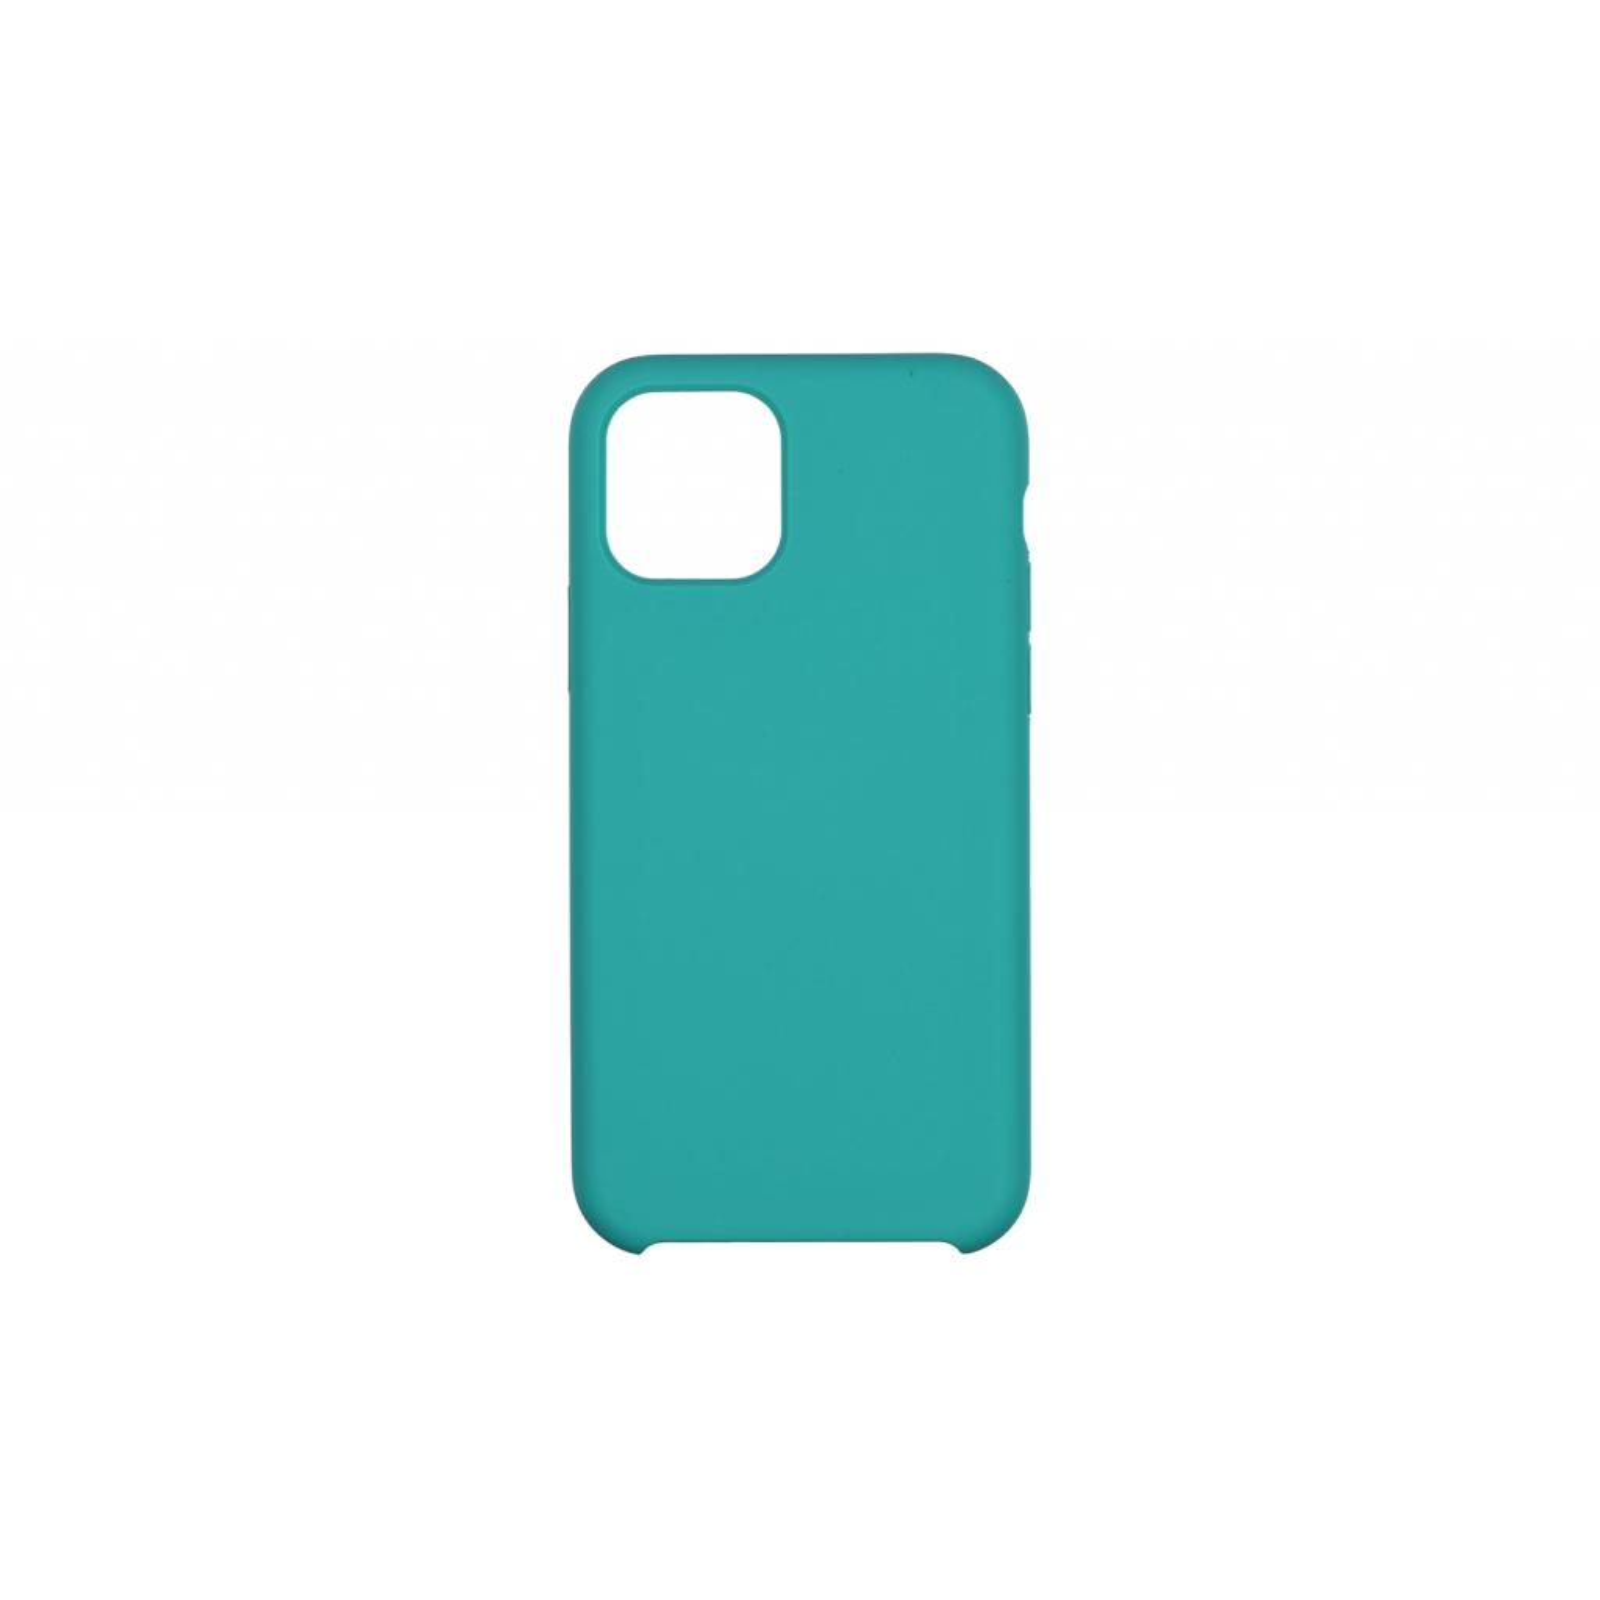 "Чехол для моб. телефона 2E Apple iPhone 11 Pro (5.8""), Liquid Silicone, Dark Green (2E-IPH-11PR-OCLS-DG)"